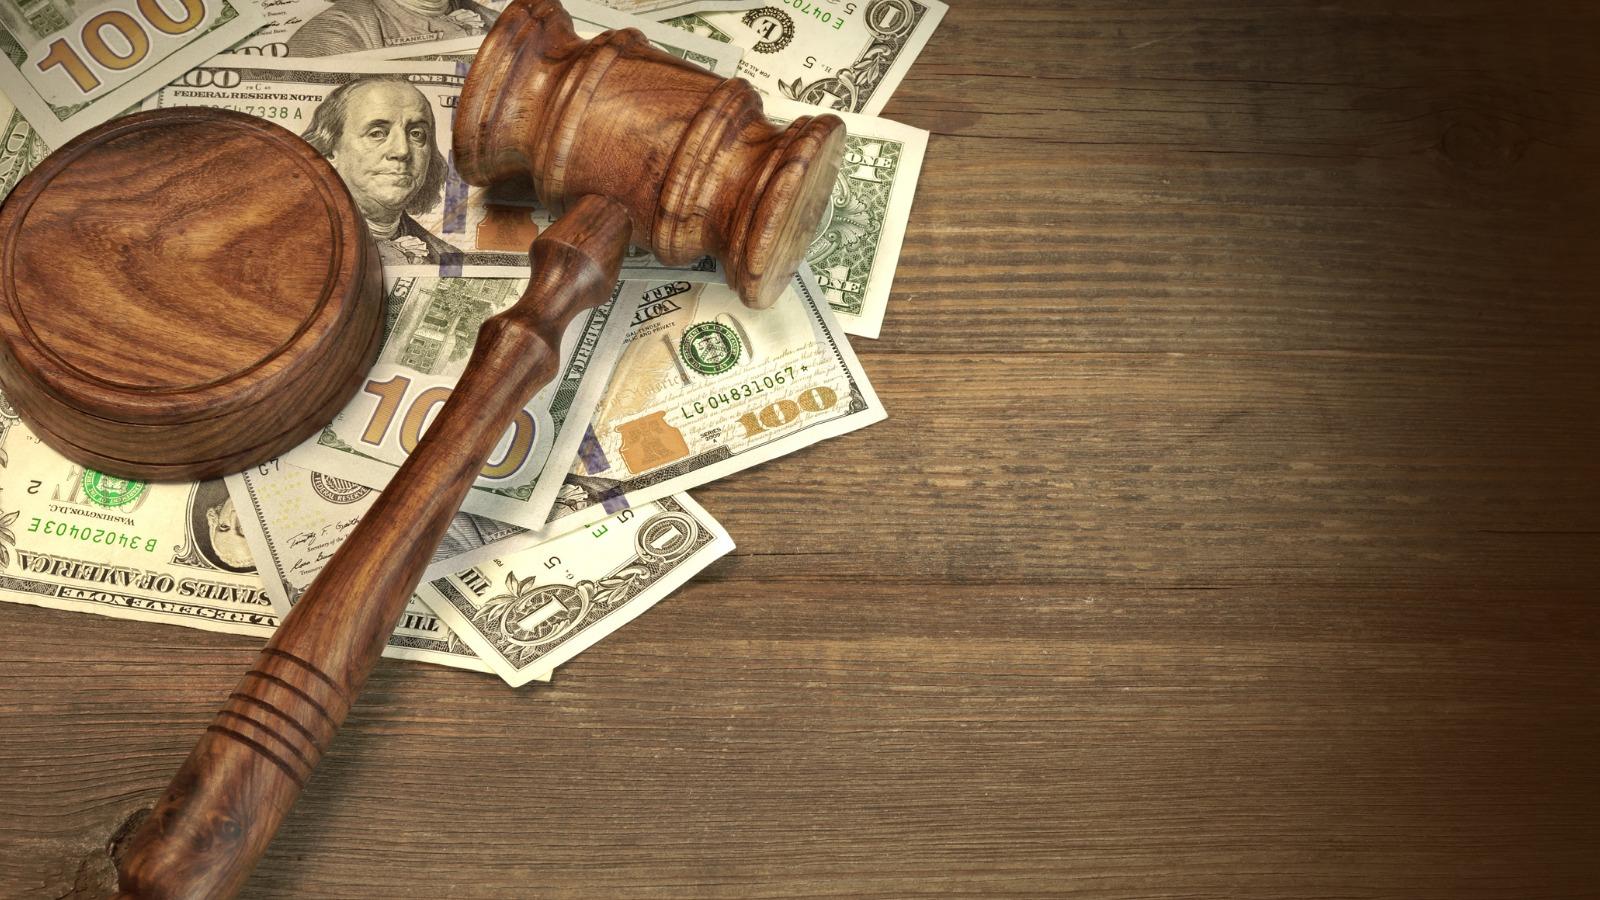 bettsllc litigation financial service litigation - 1600 x 900 px.jpg